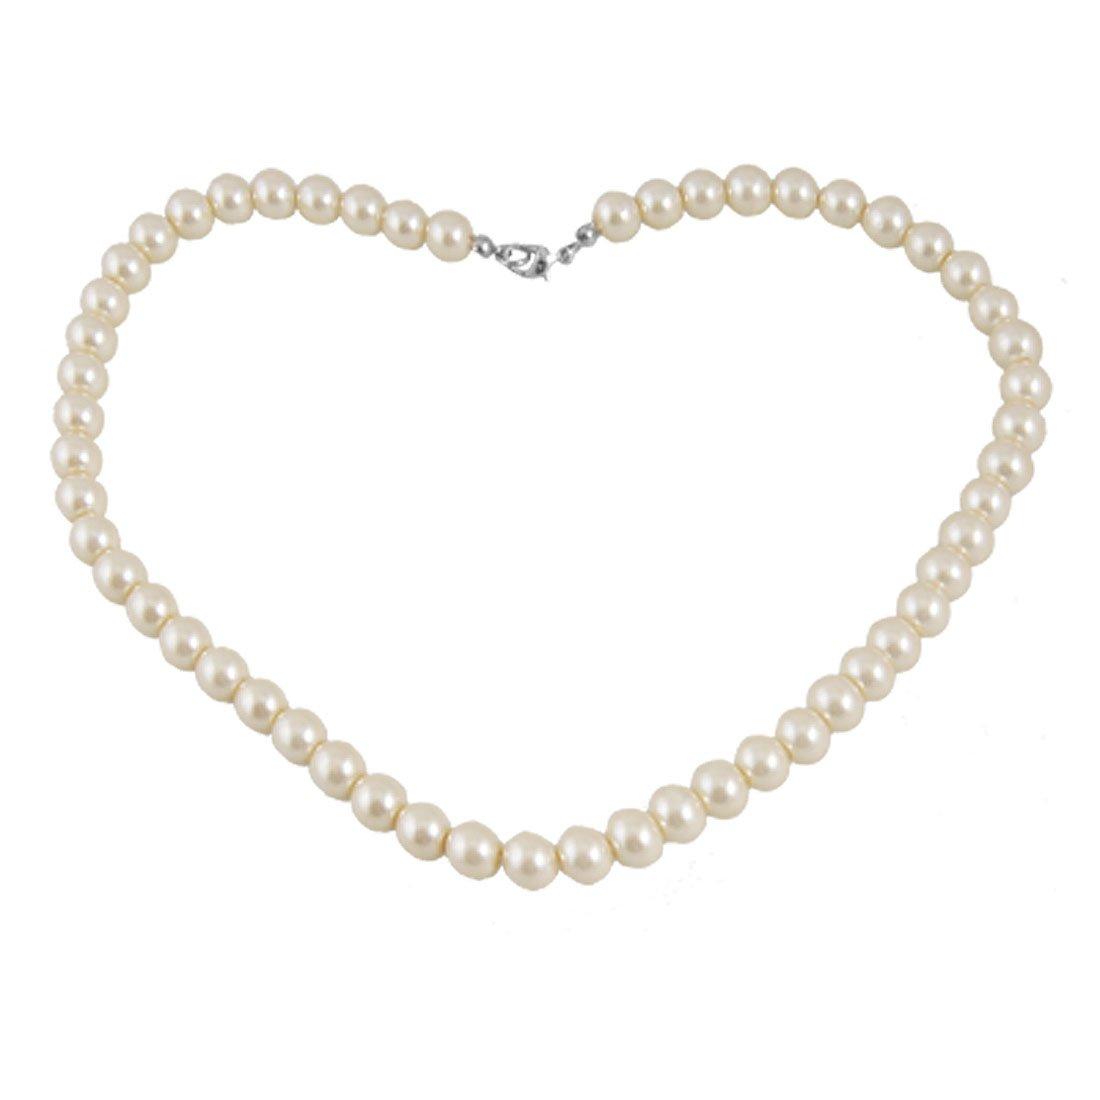 Pearl Necklace Clasp: Plastic Screw Clasp White Single Strand Faux Pearl